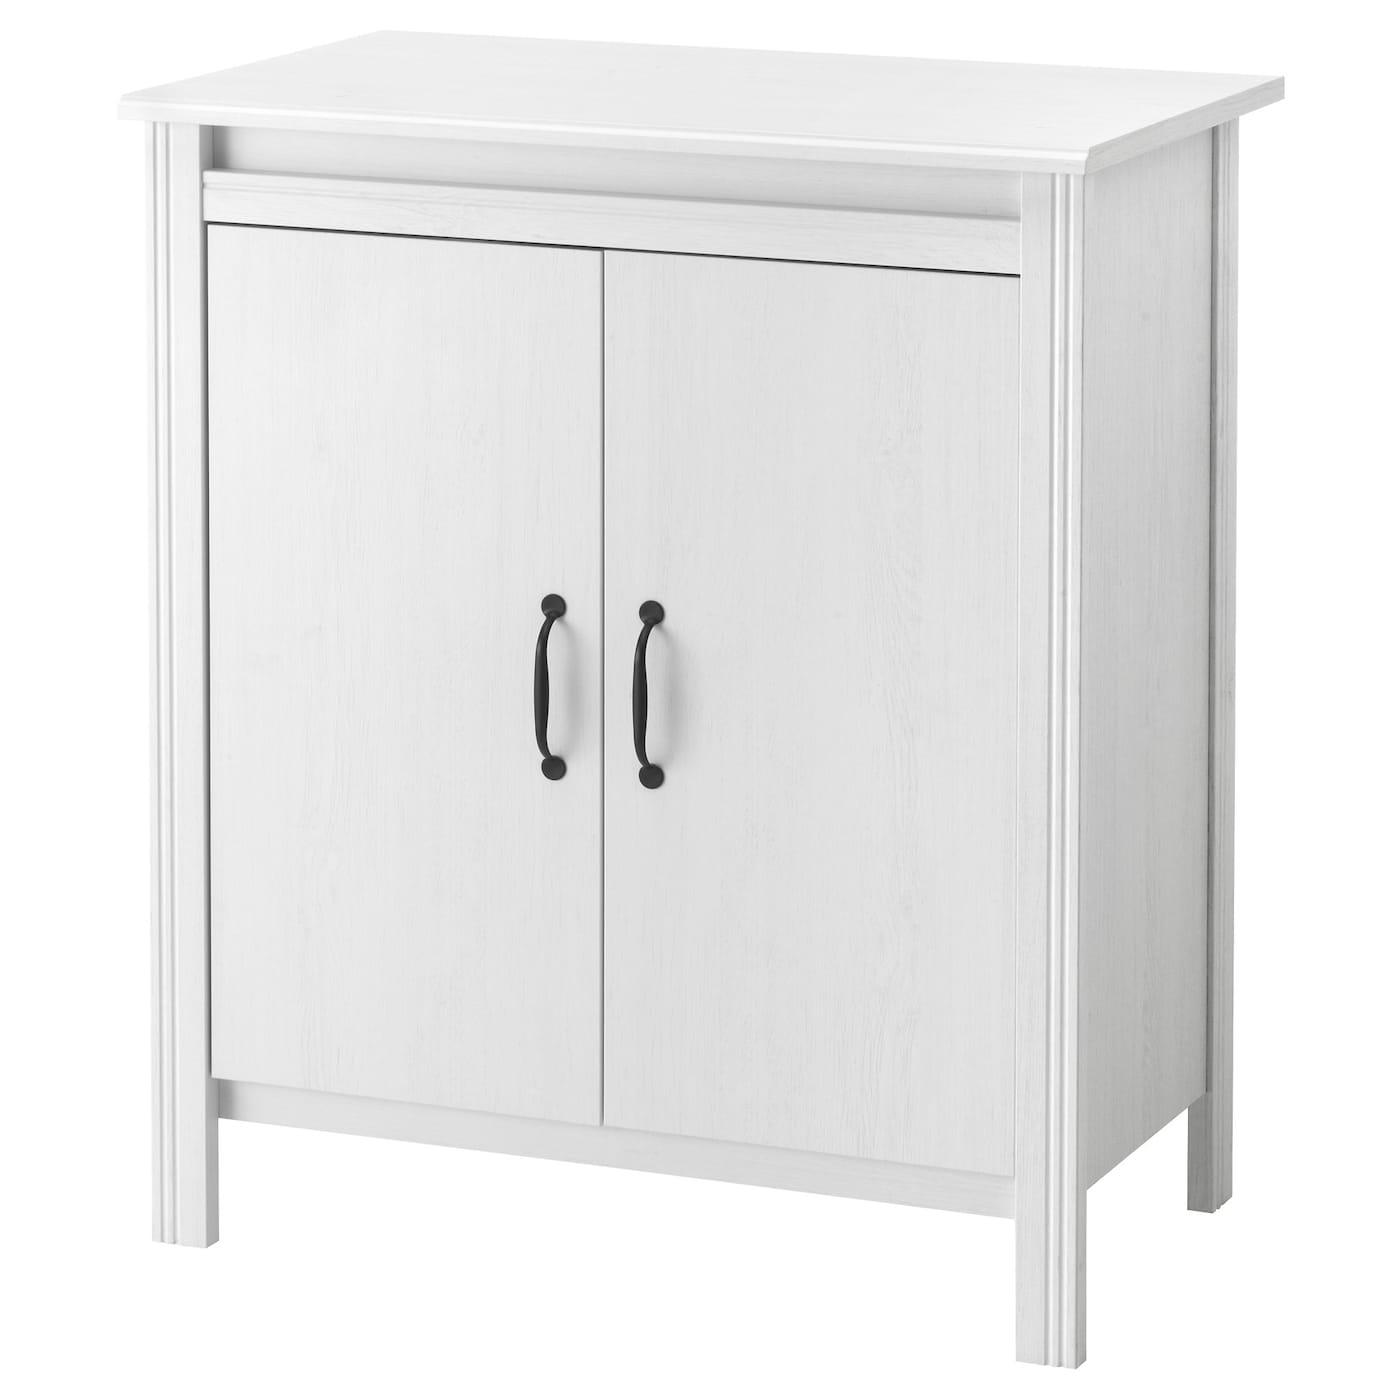 brusali armoire avec portes blanc 80x93 cm ikea. Black Bedroom Furniture Sets. Home Design Ideas